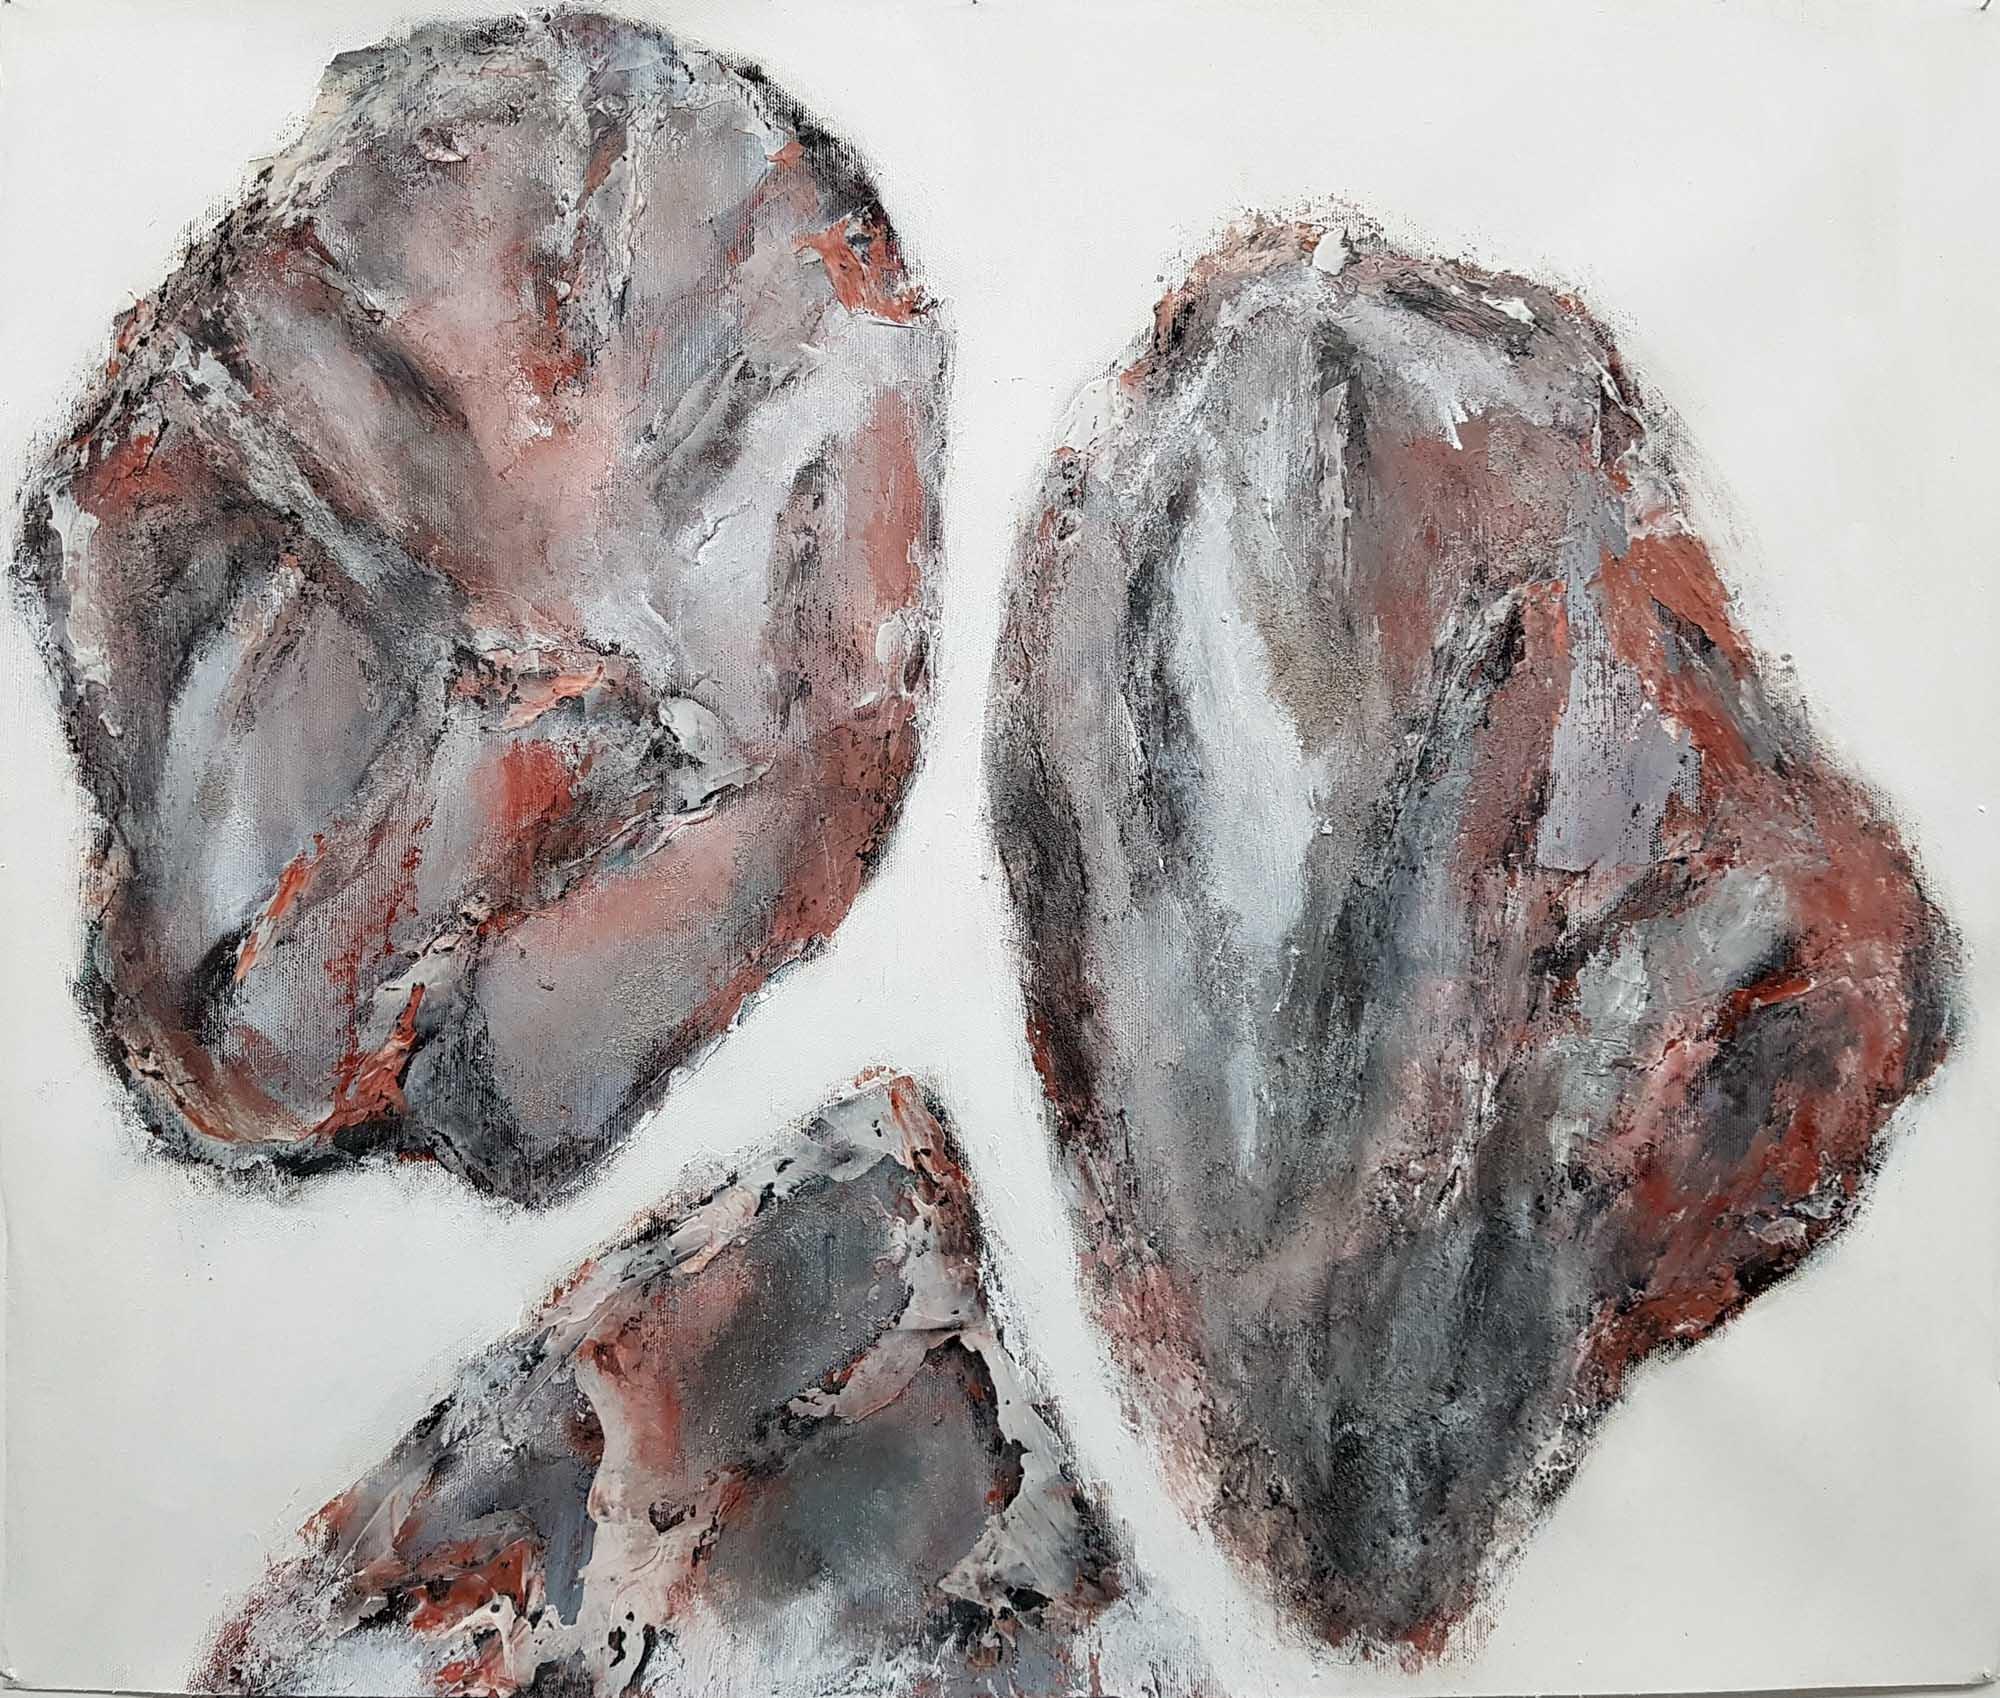 Lignite-Empreinte -Minerais--59x72cm-Toile